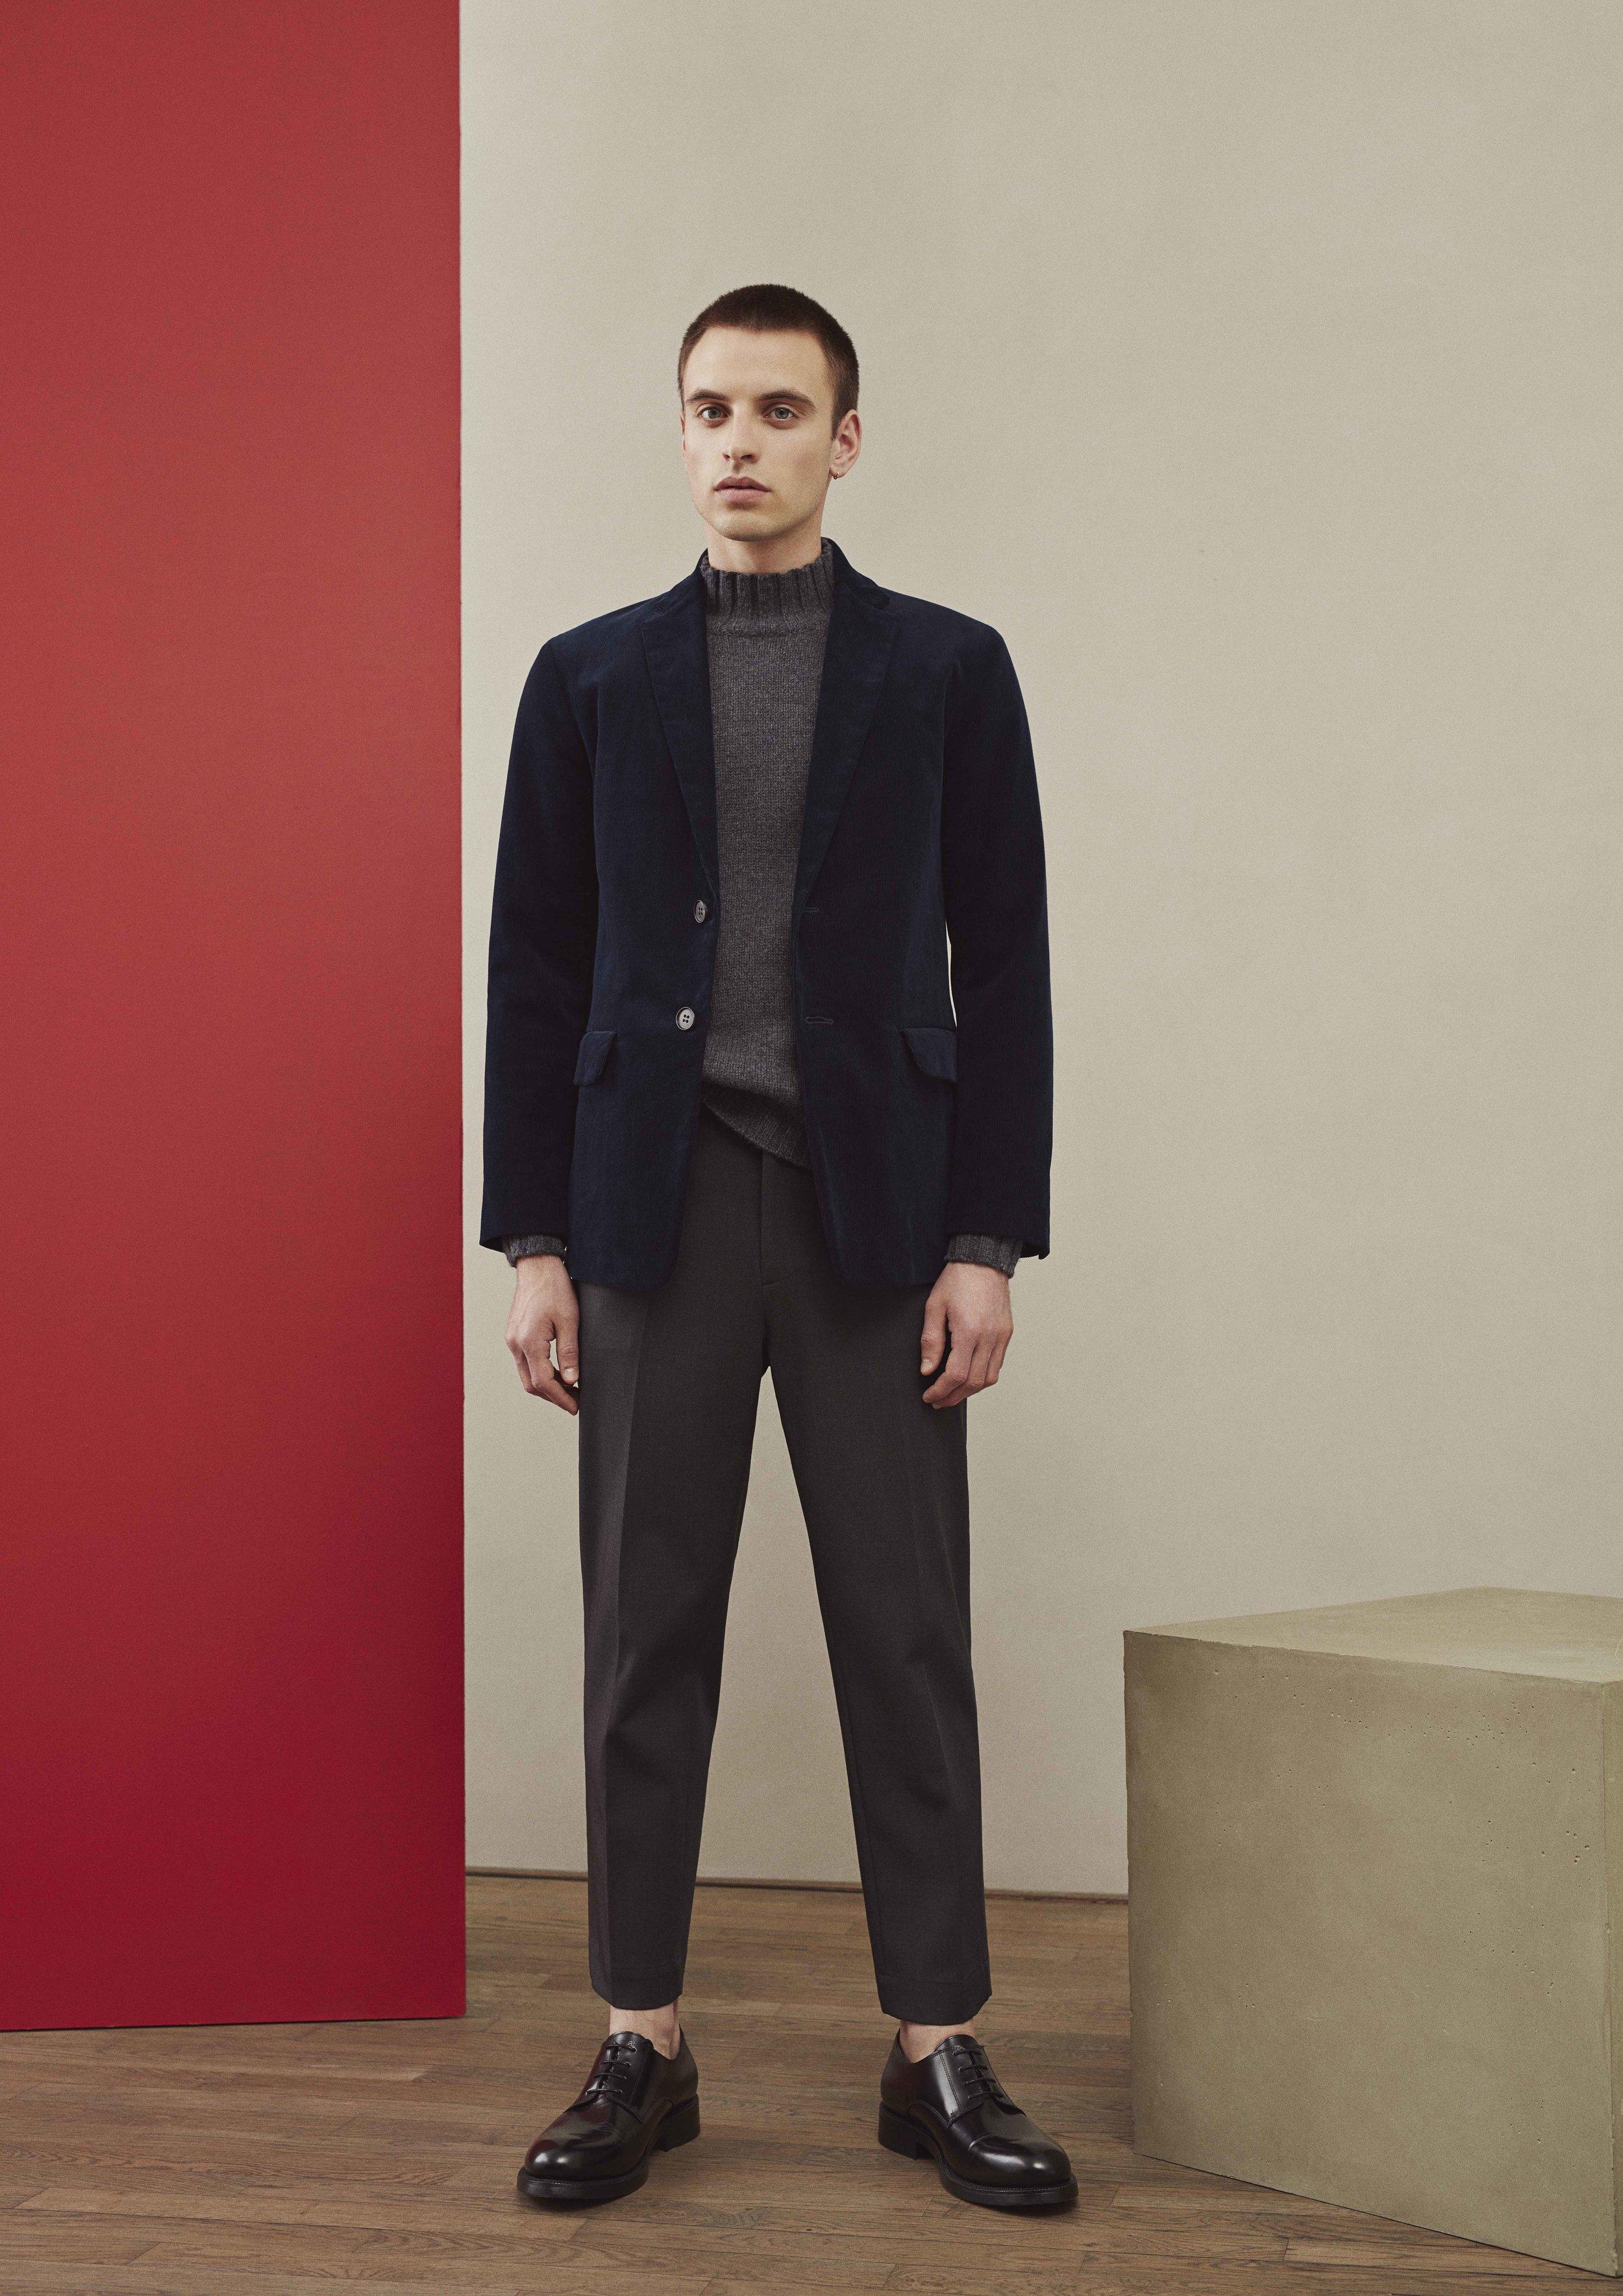 <b>5</b><br>Frederic Corduroy Blazer<br>Norman Wool Sweater<br>Albert Cotton Pants